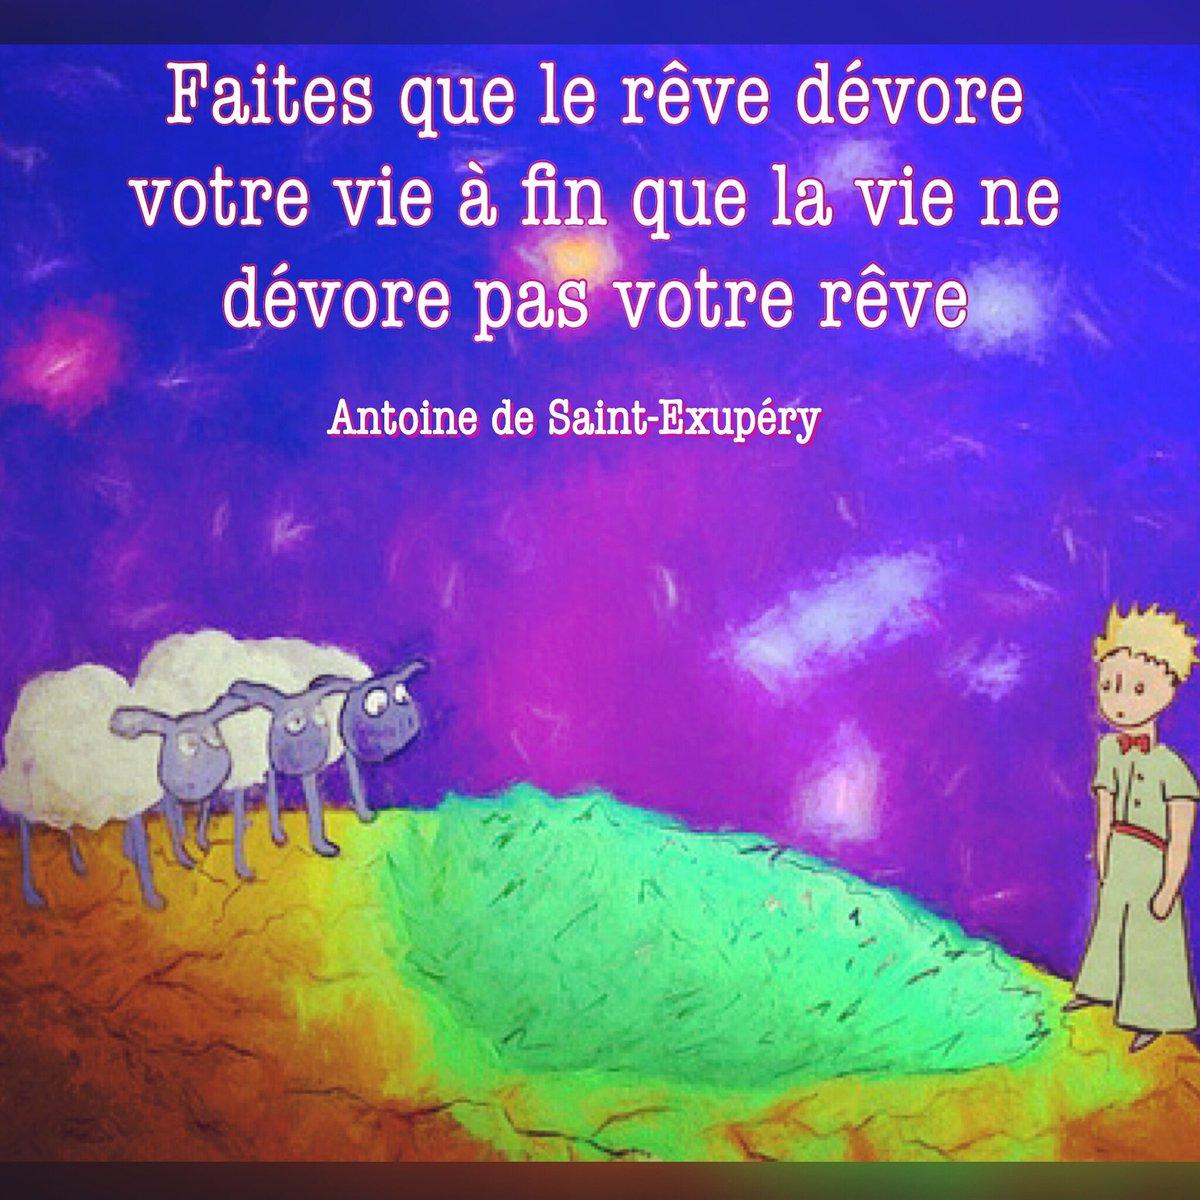 Make your dream devour your life so that life doesn&#39;t devour your dream  #lepetitprince #quoteoftoday #citationdujour <br>http://pic.twitter.com/pNPgEOEBTu